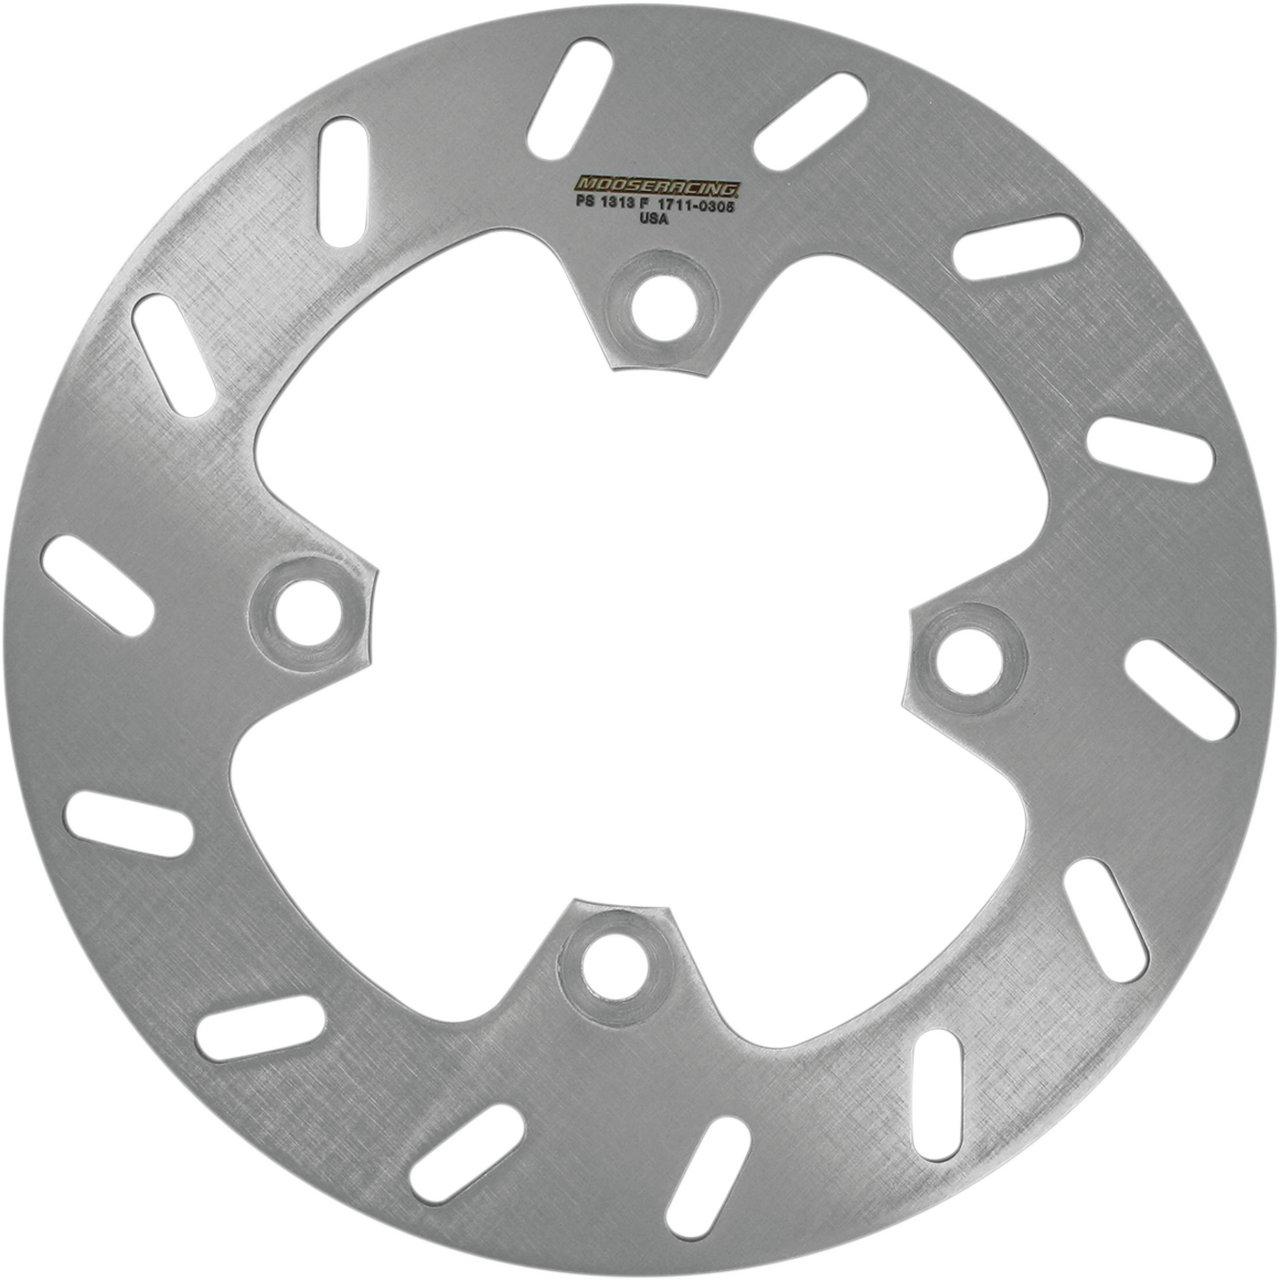 【MOOSE RACING】維修用煞車碟盤 [1711-0444] - 「Webike-摩托百貨」